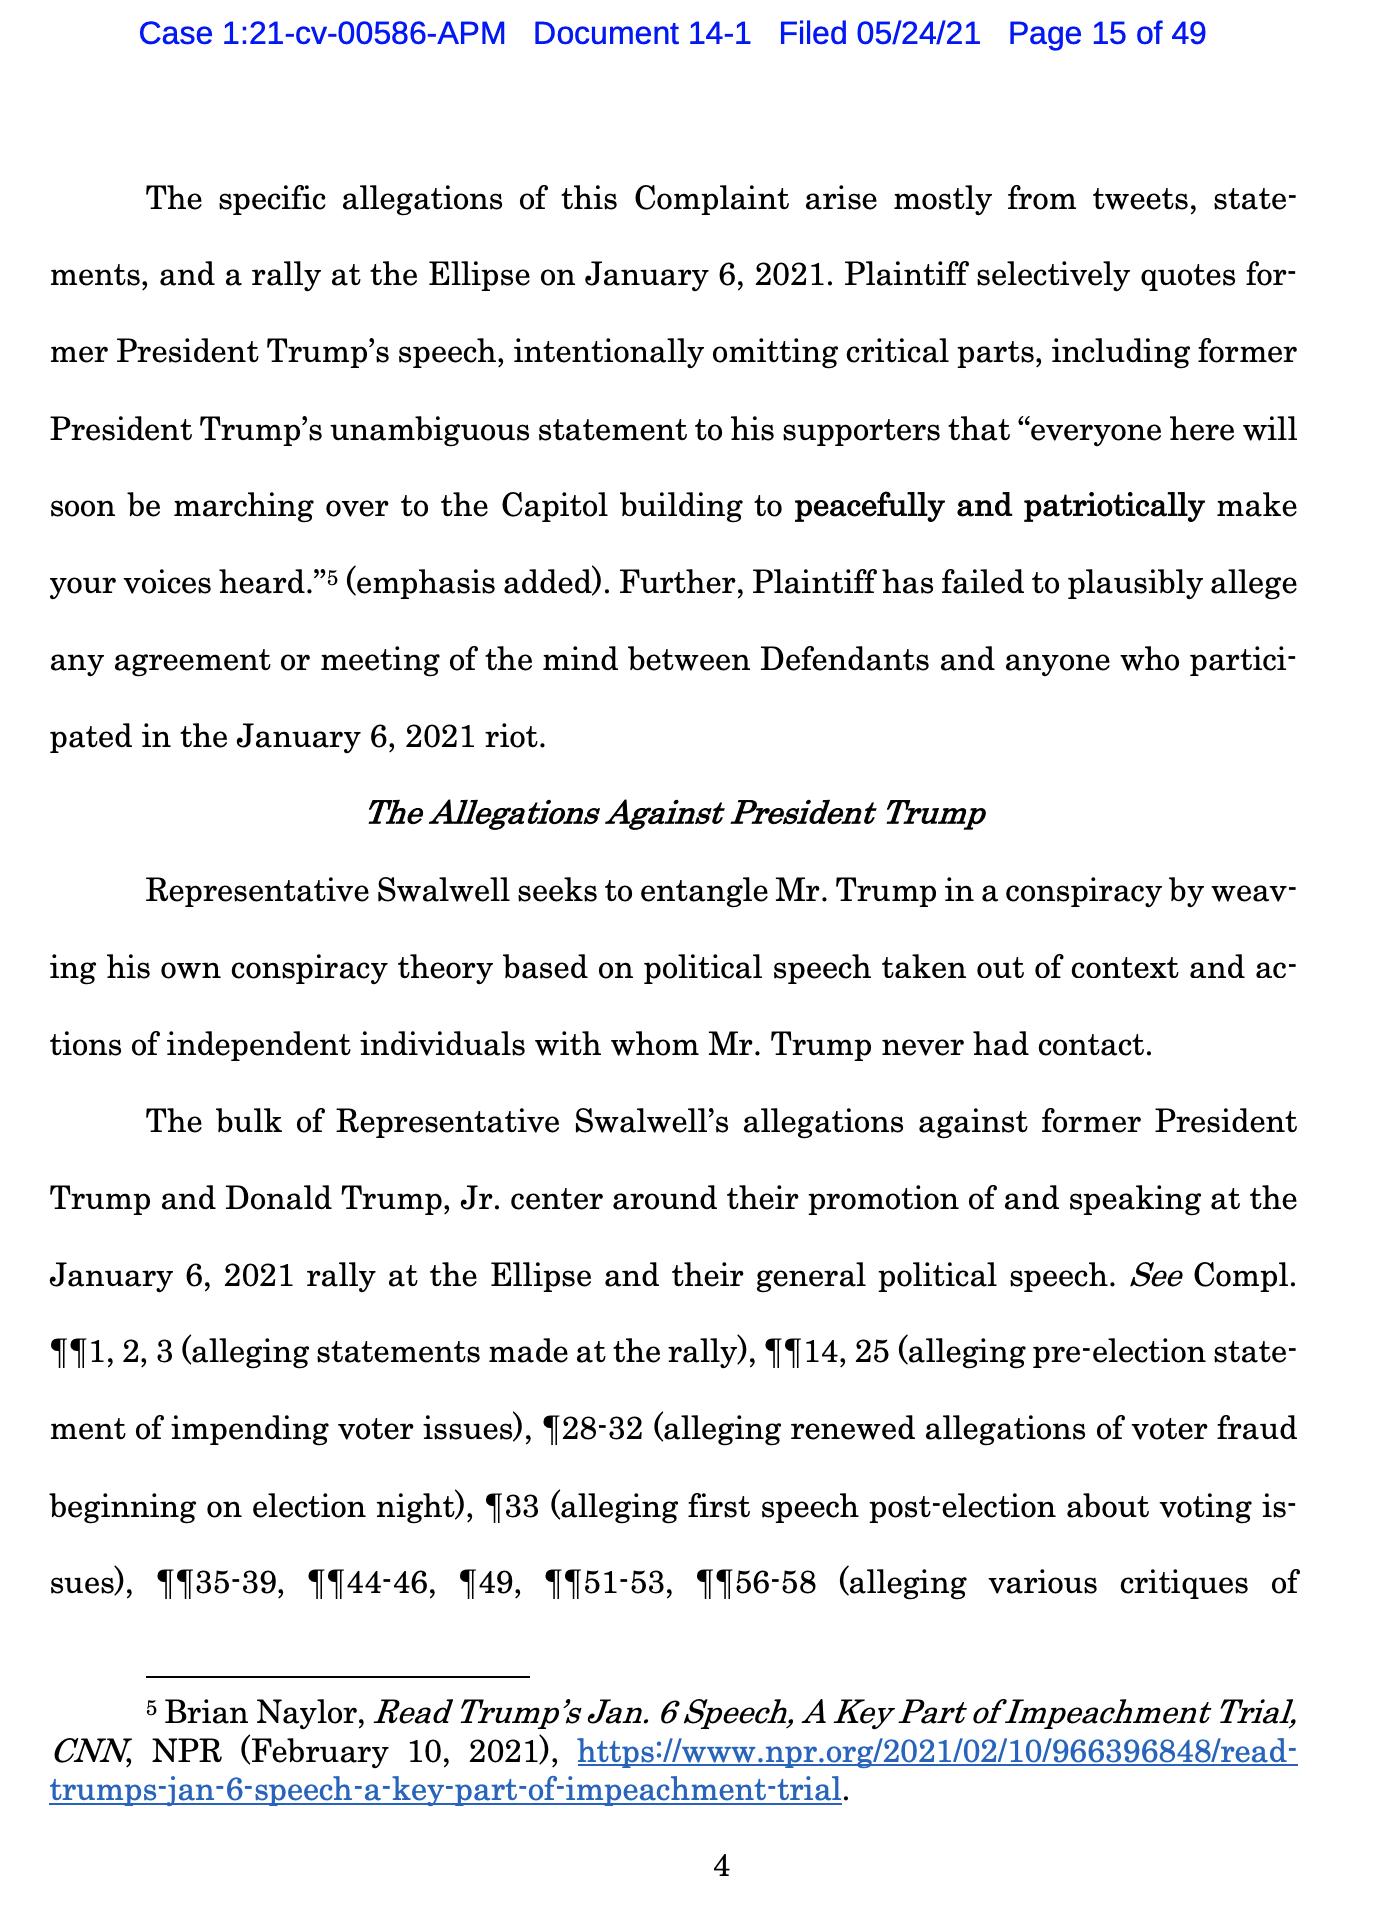 Screen-Shot-2021-05-25-at-9.49.24-AM Trump Declares Full Immunity From Jan. 6 Insurrection Lawsuit Crime Donald Trump Featured Politics Top Stories